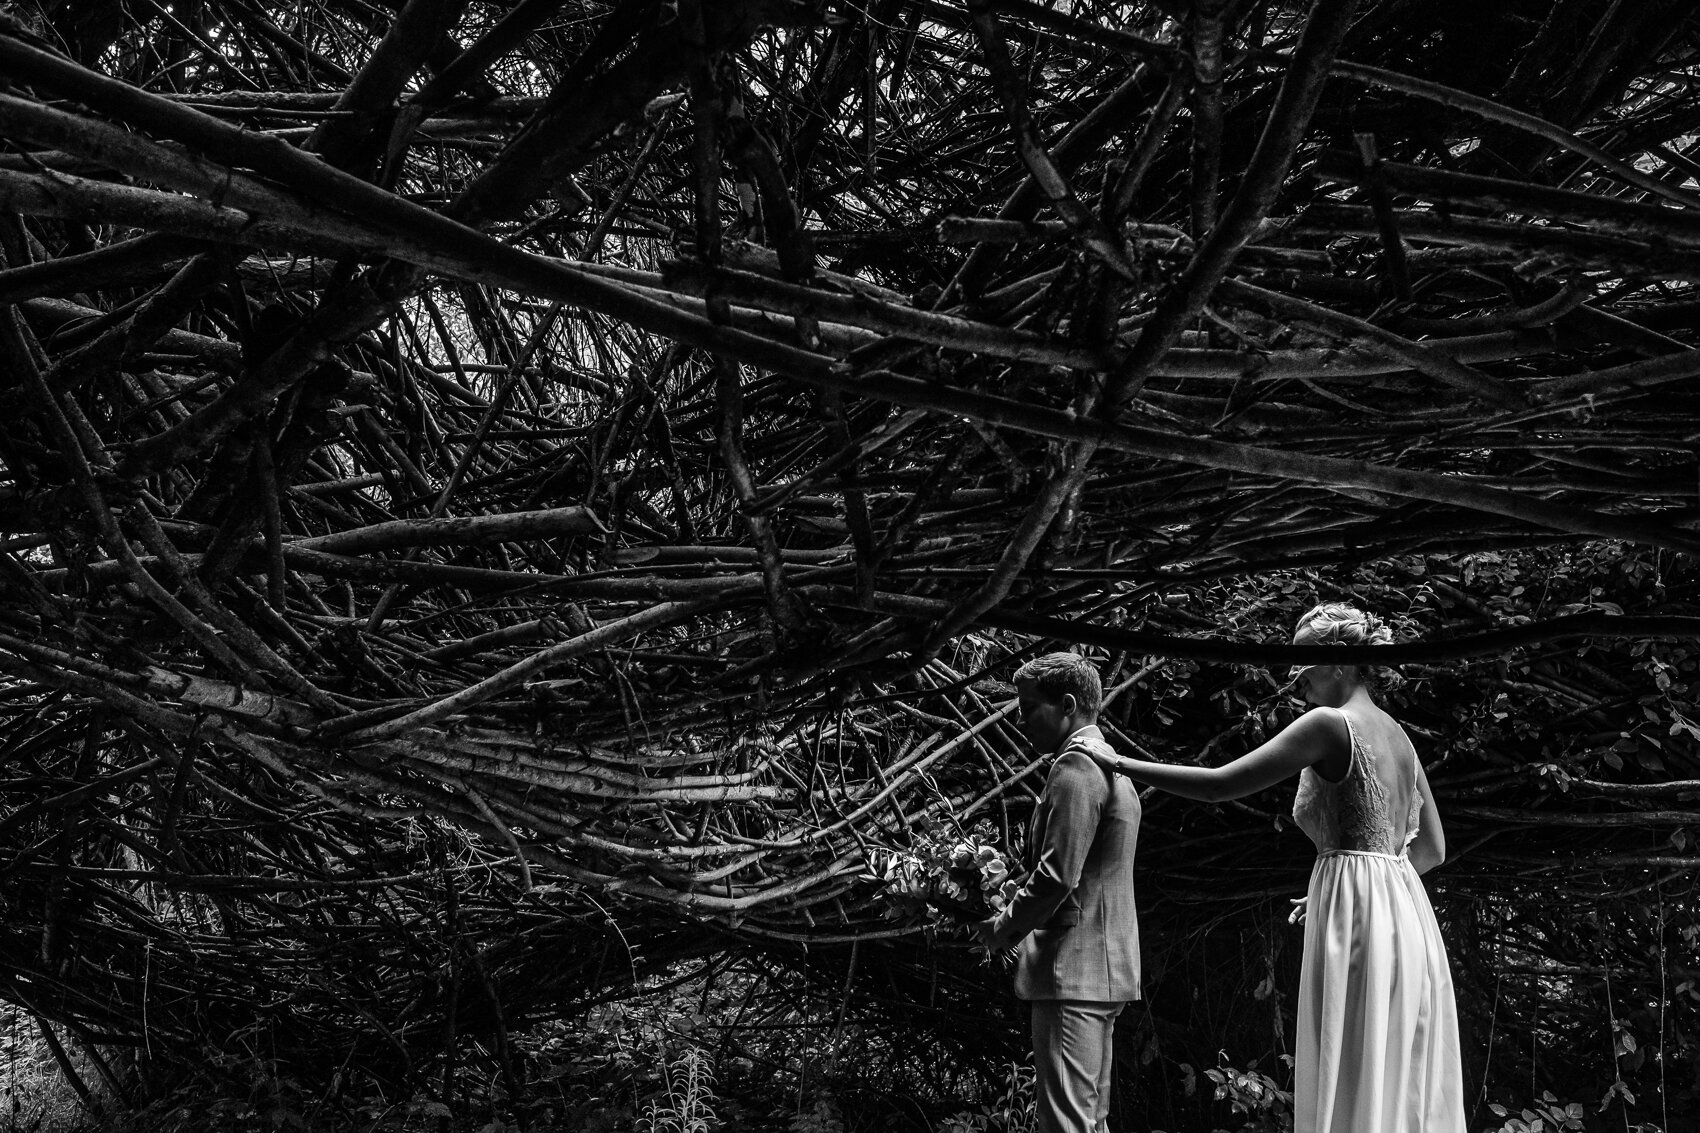 iso800 - huwelijksfotograaf isabo matthias verbeke foundation-7.jpg